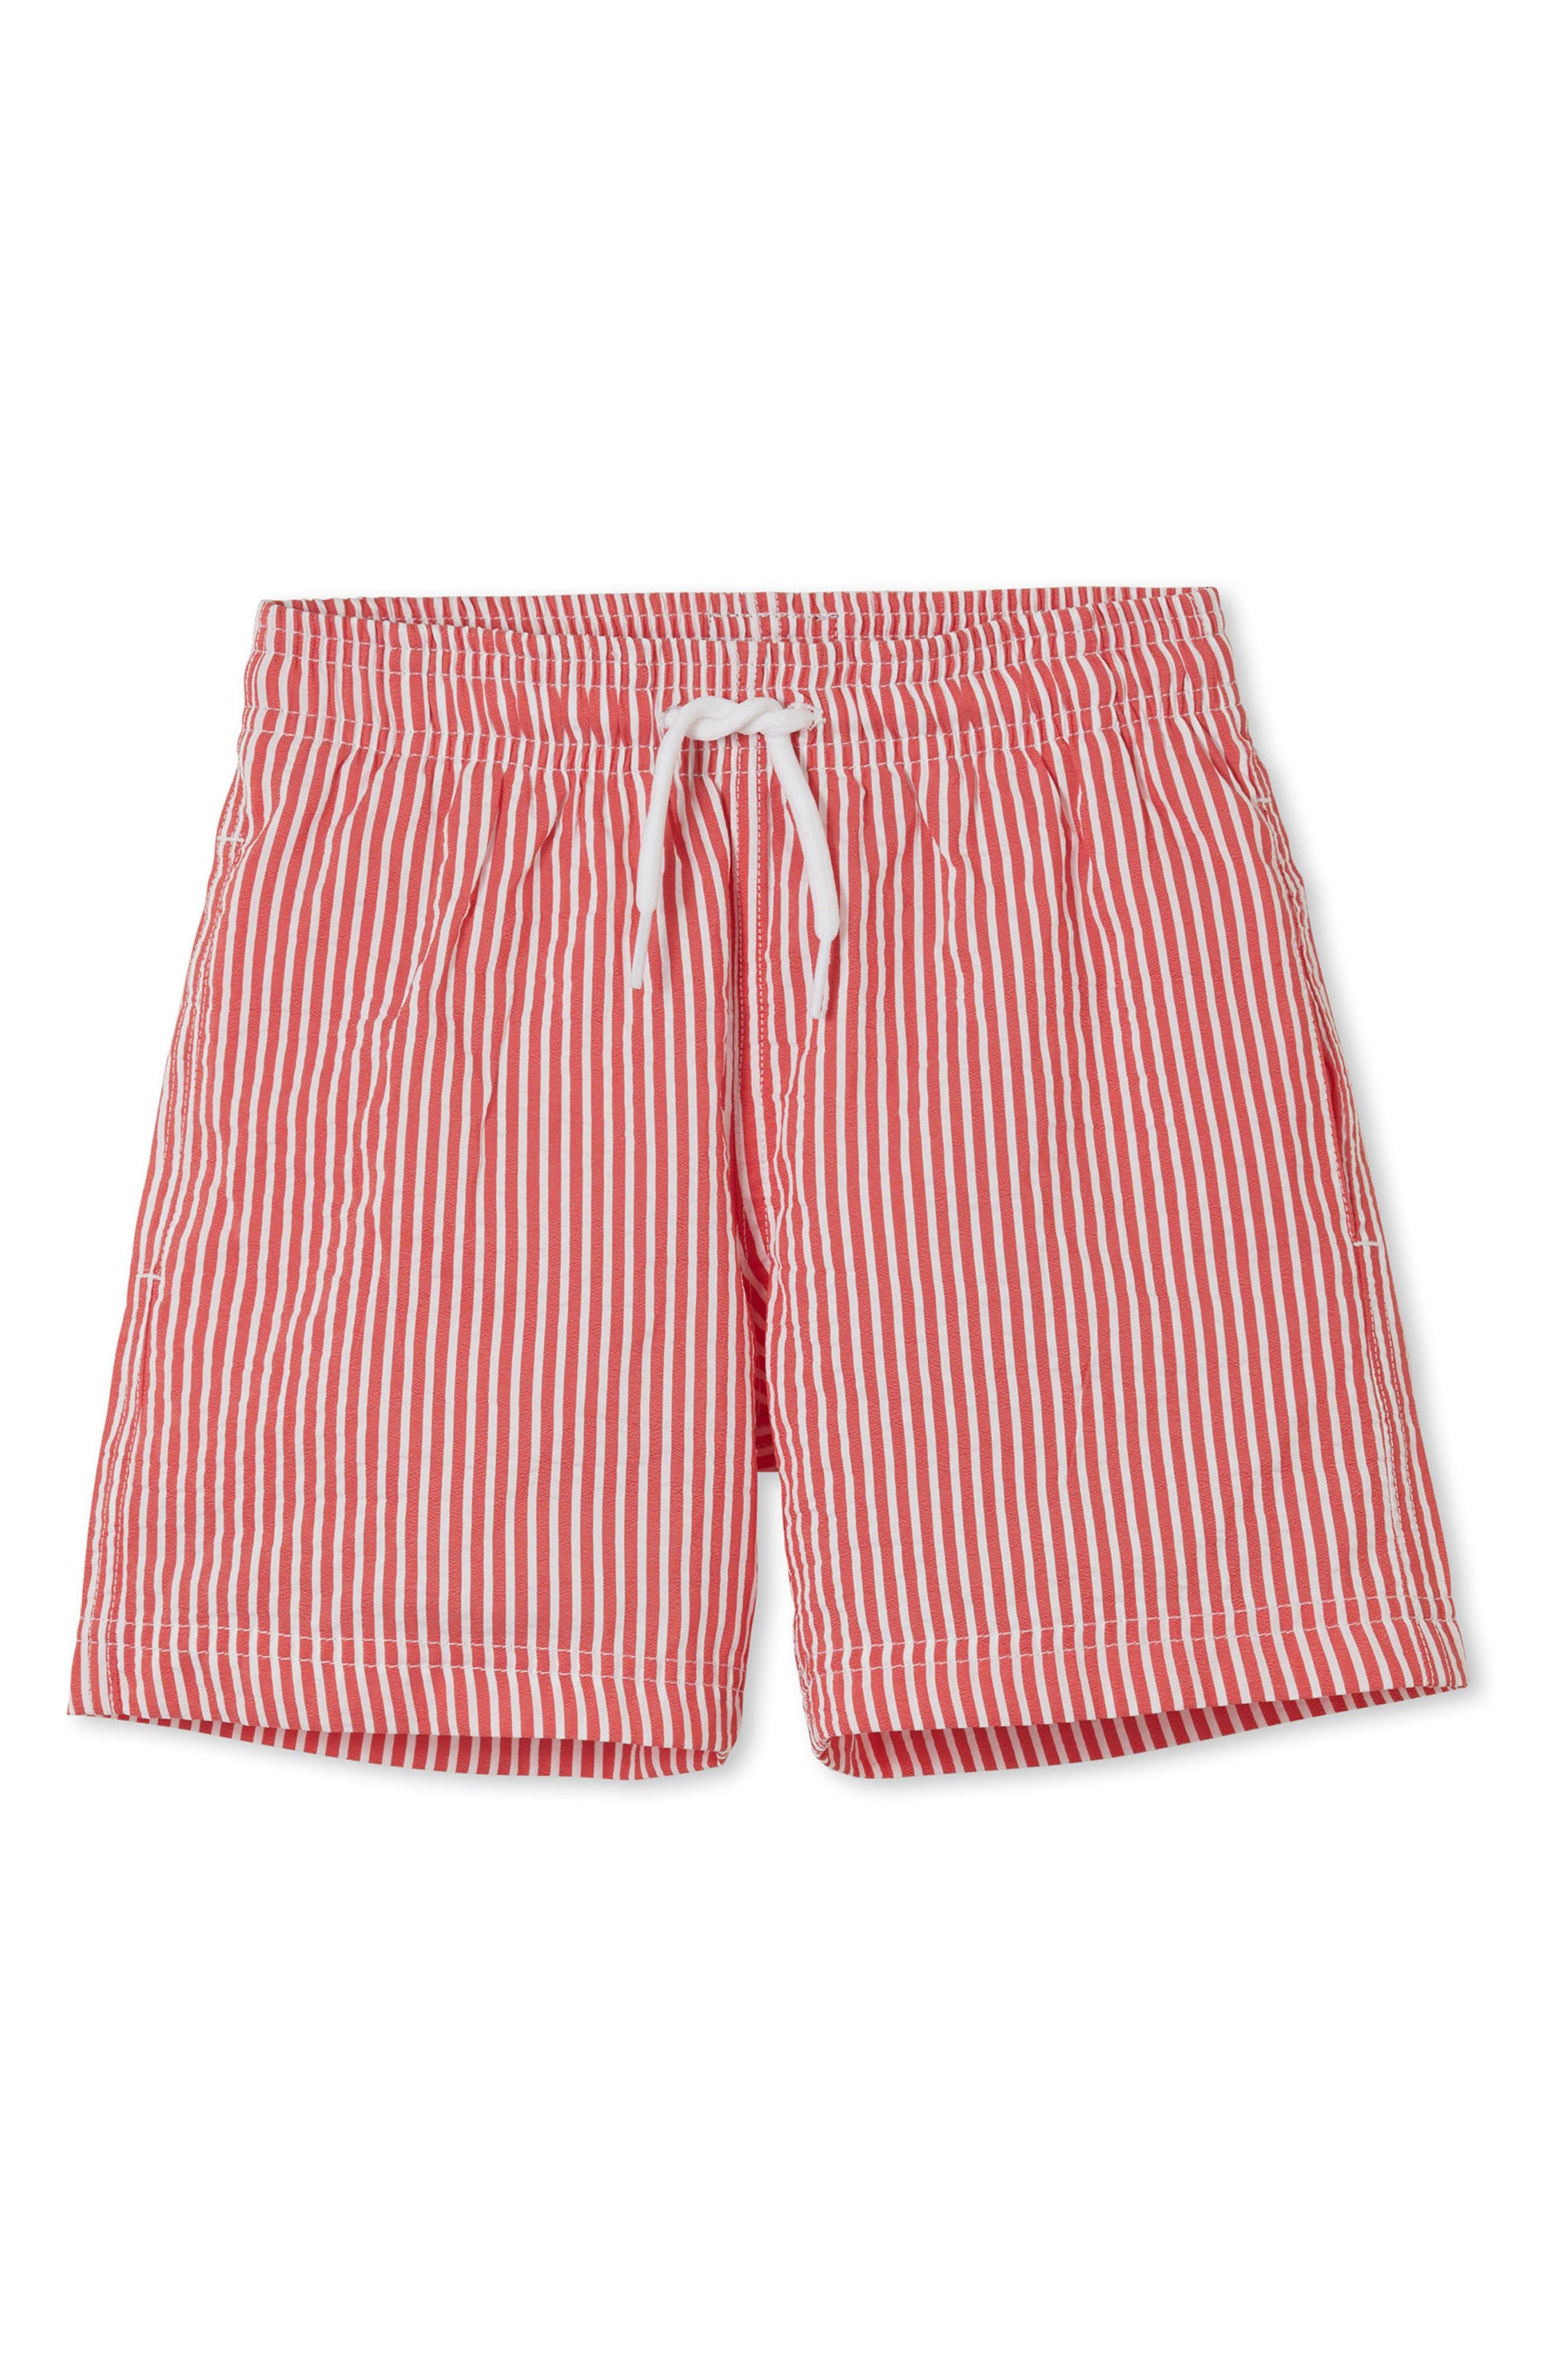 Red Stripe Swim Trunks,                         Main,                         color, 600